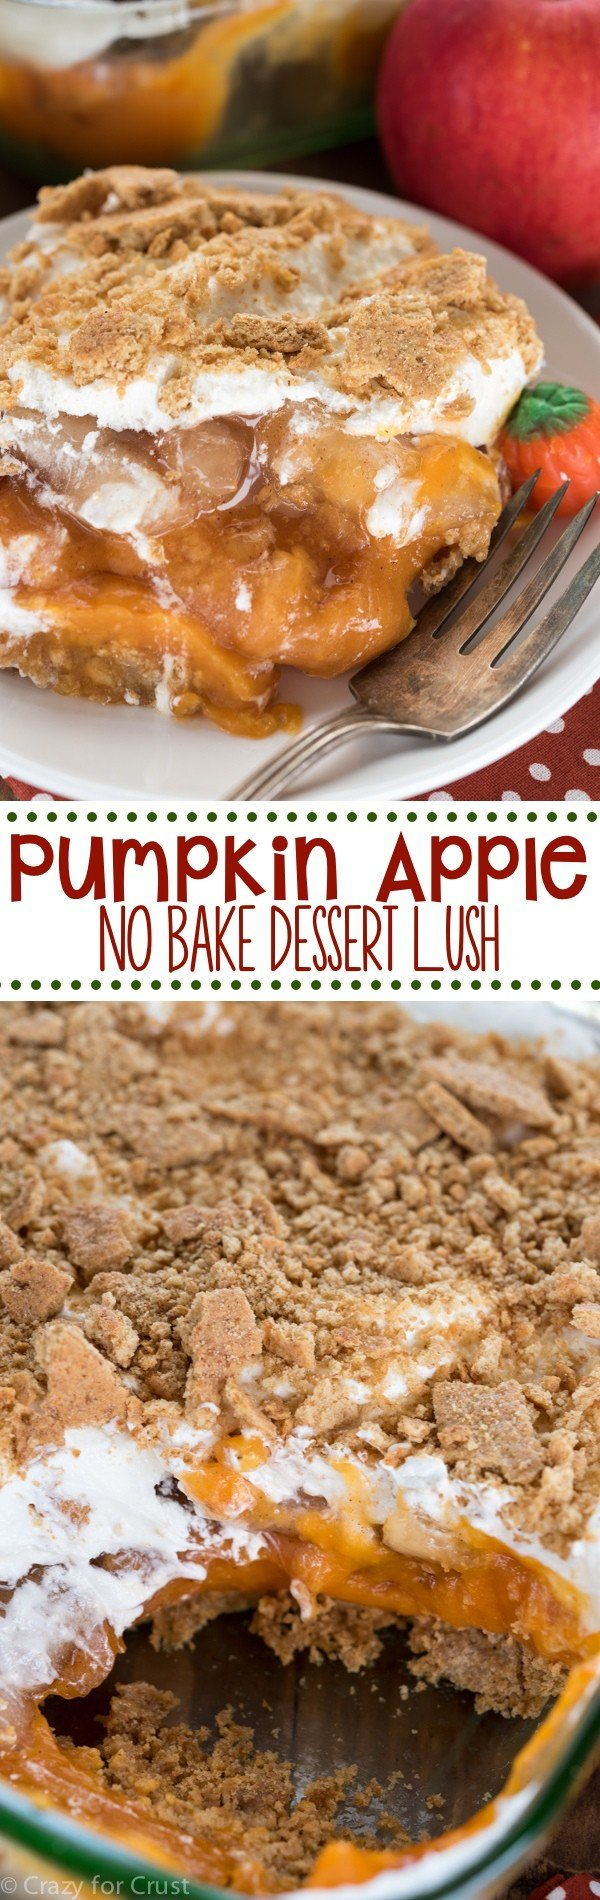 Pumpkin Apple No Bake Dessert Lush - such an easy recipe! No-bake pumpkin pie is mixed with apple pie and a cinnamon graham crust!